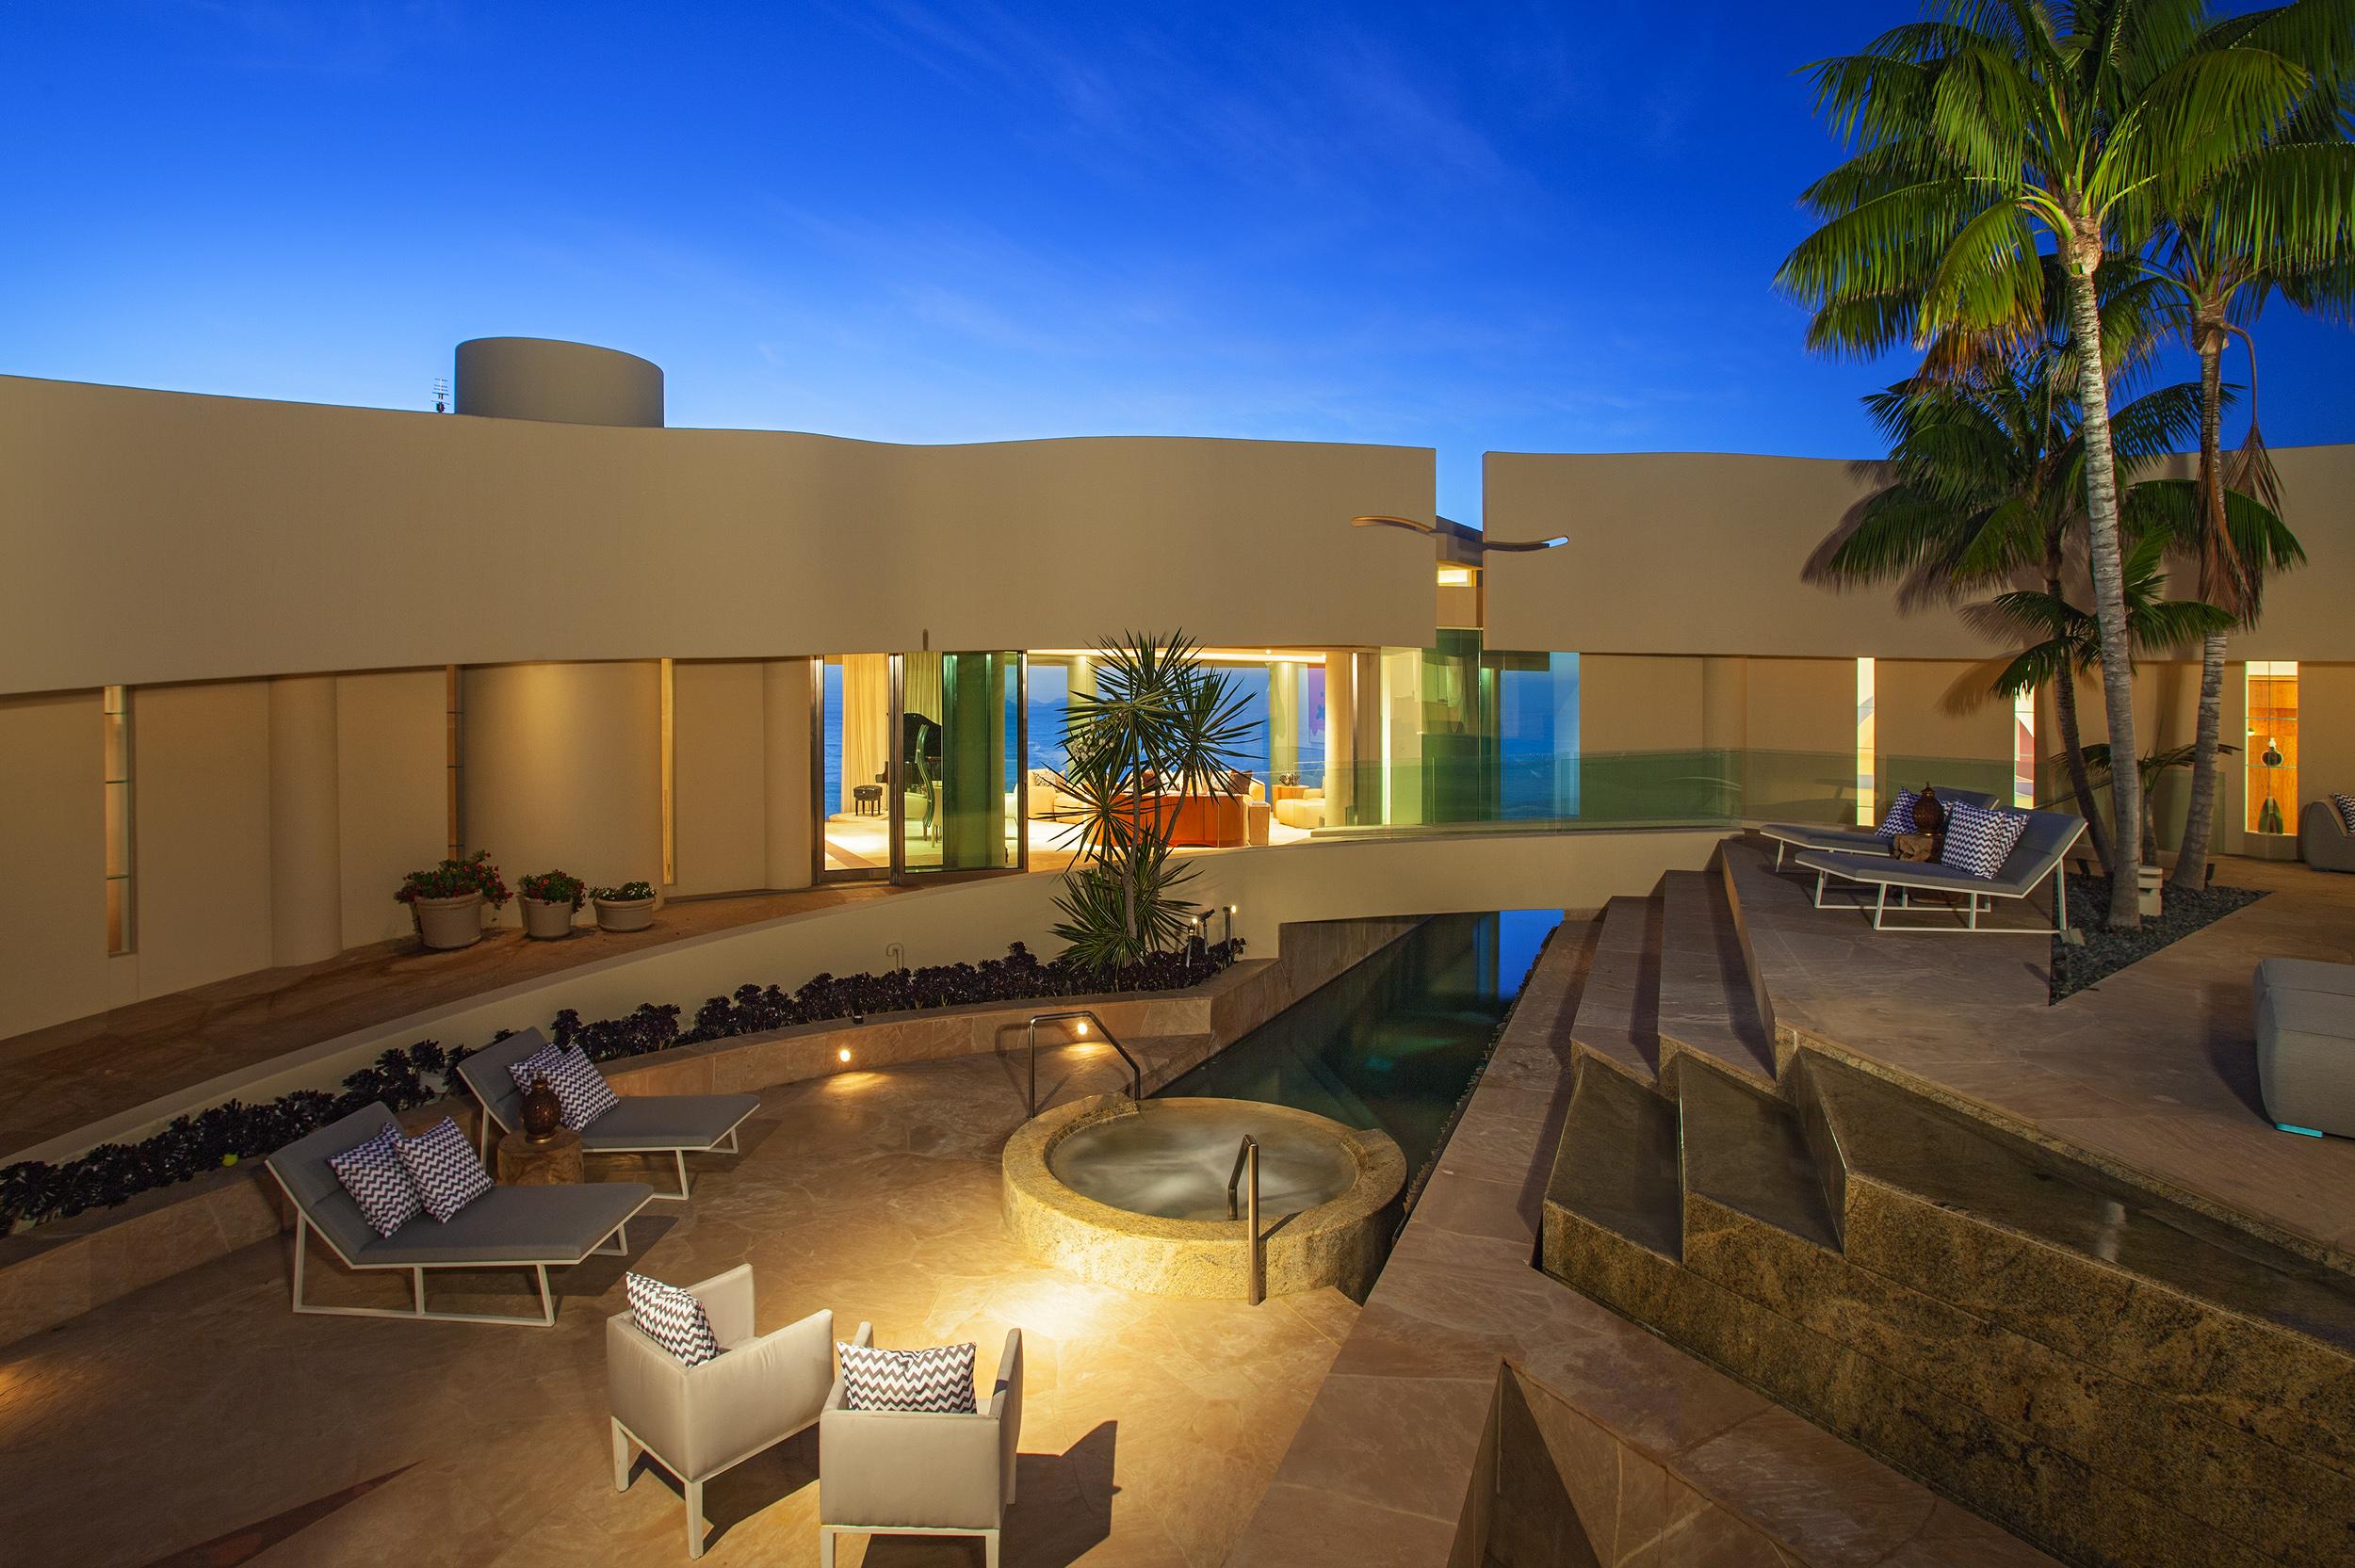 Sold 2015 Represented Seller -  La Jolla, CA 92037